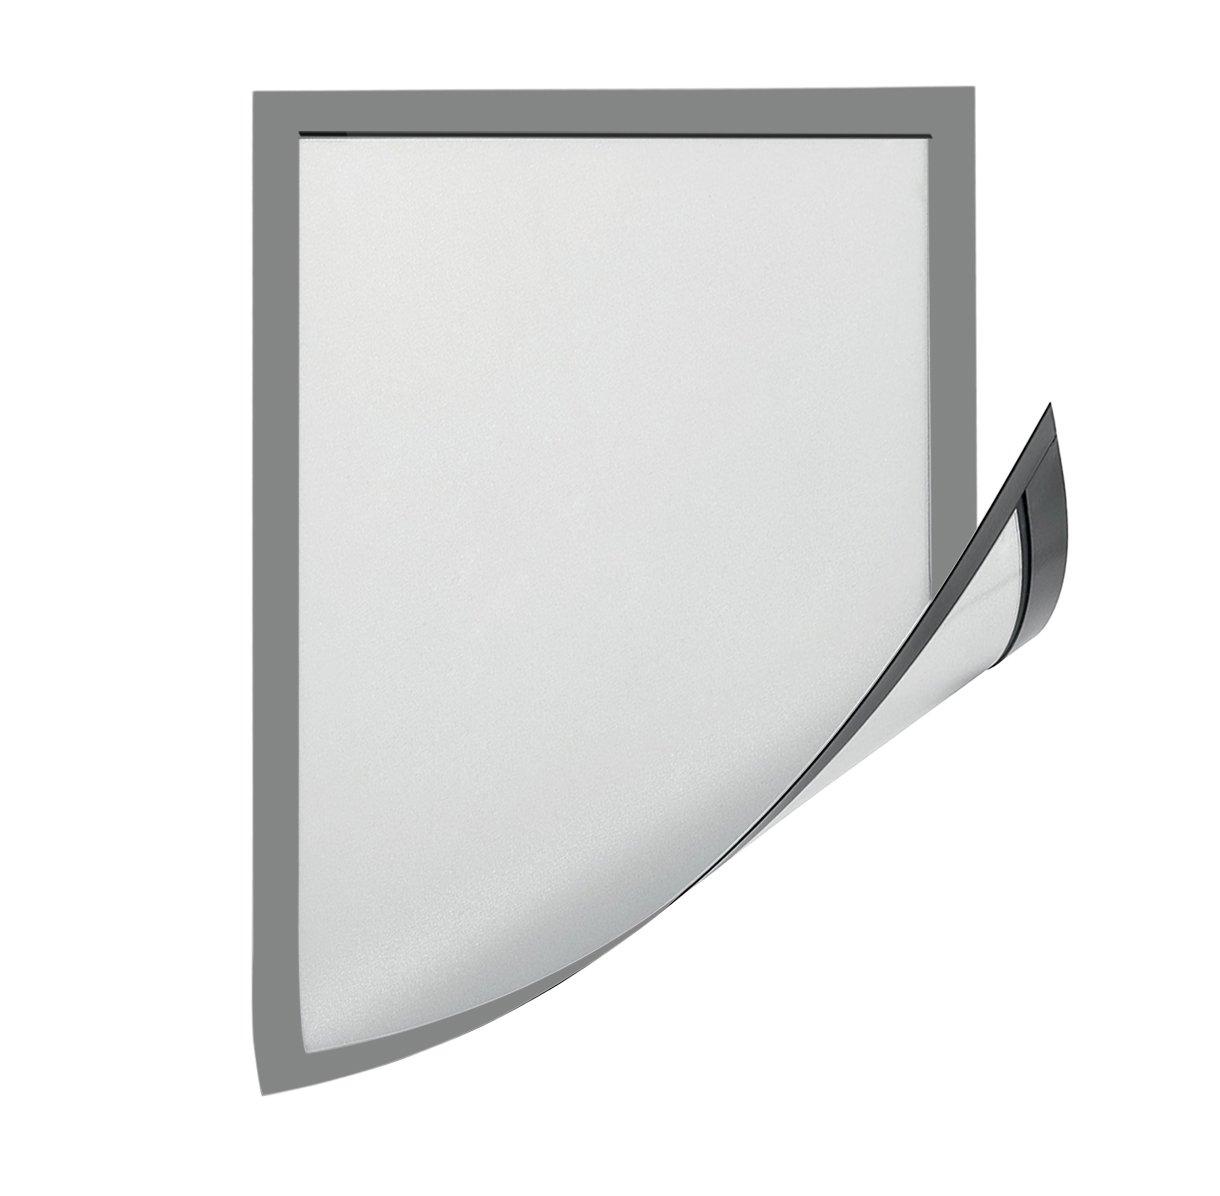 6xA3 Grey Magiboards solo magnetico Paper holder-ph